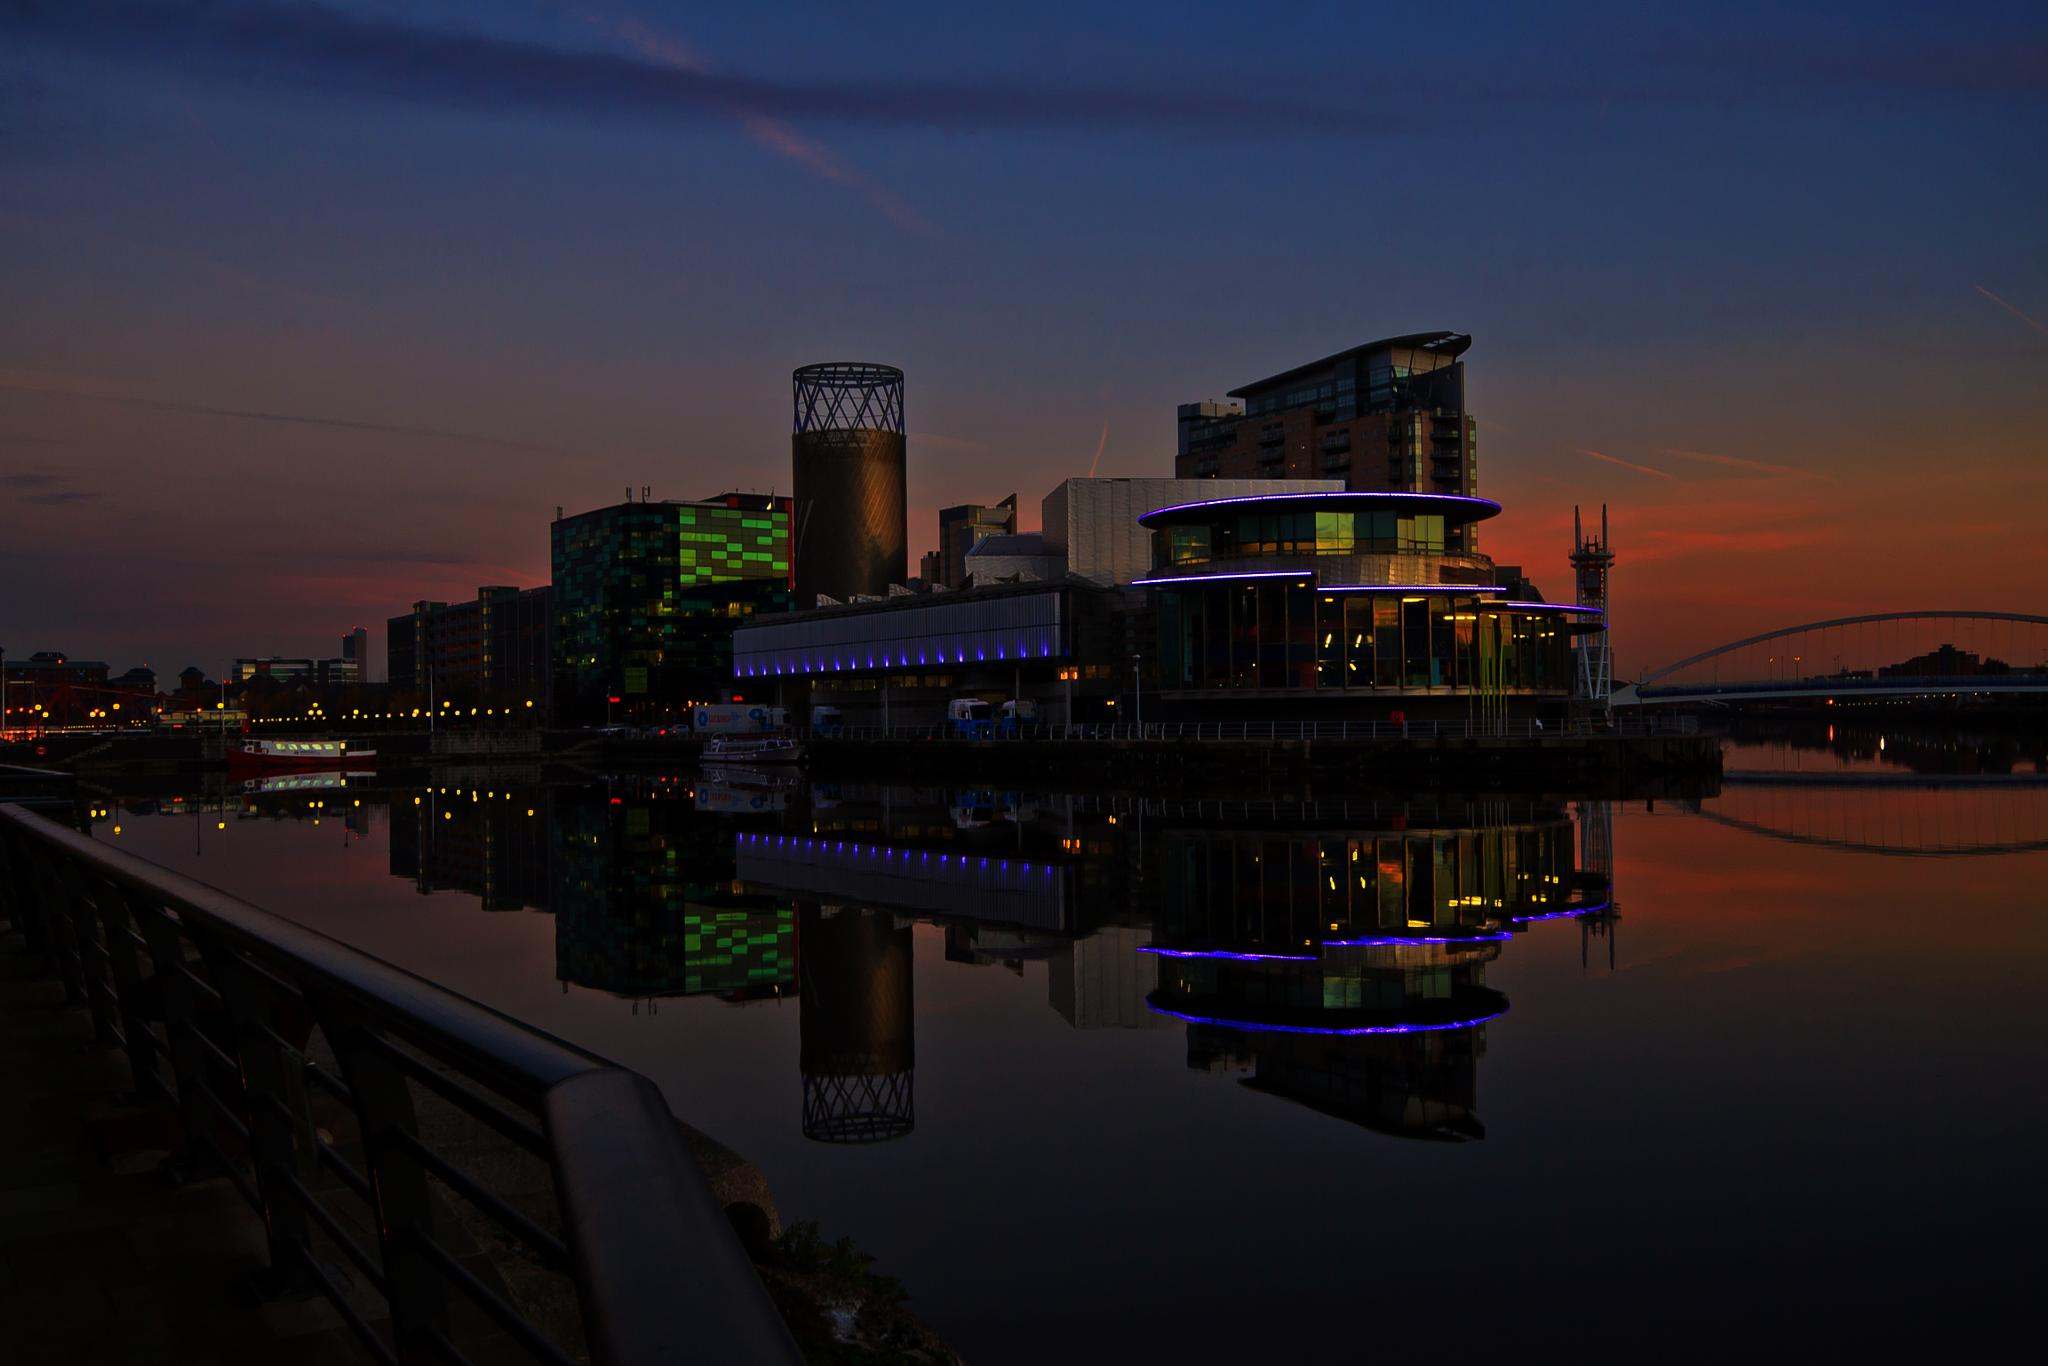 Sunset by Steve Rawlings